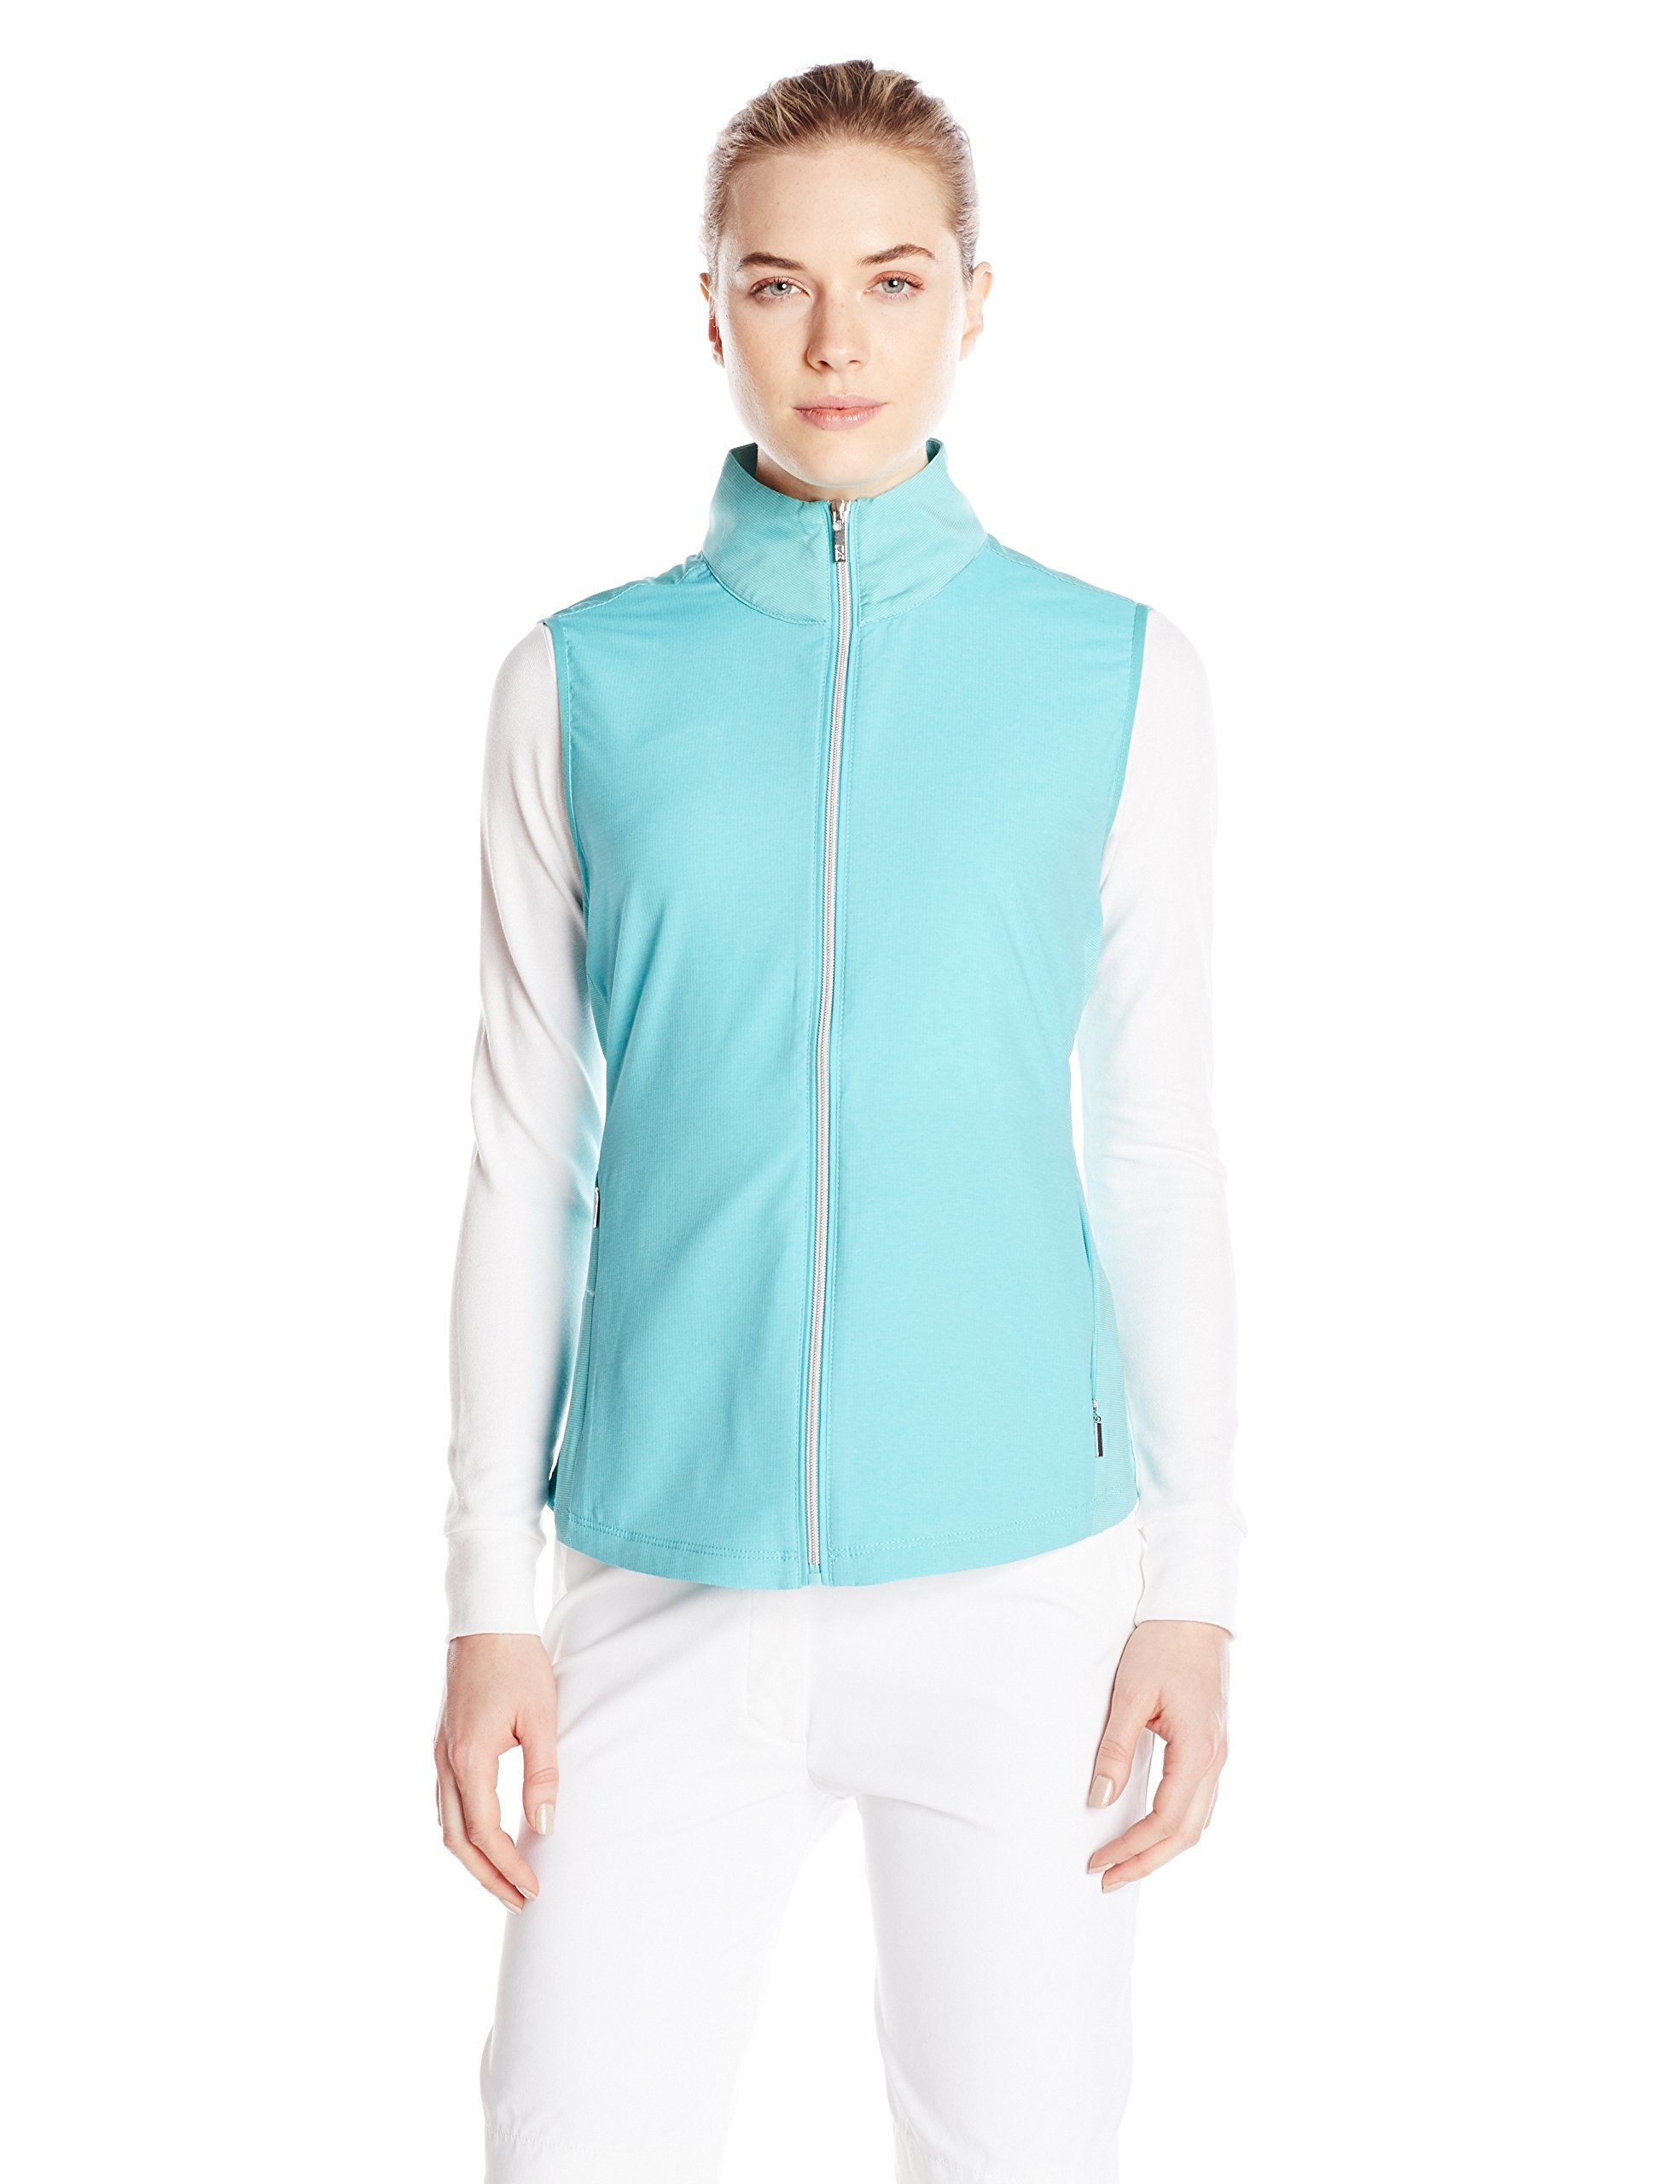 Cutter & Buck Women's CB Weathertec Laura Hybrid Vest, Quench Small by Cutter & Buck (Image #1)